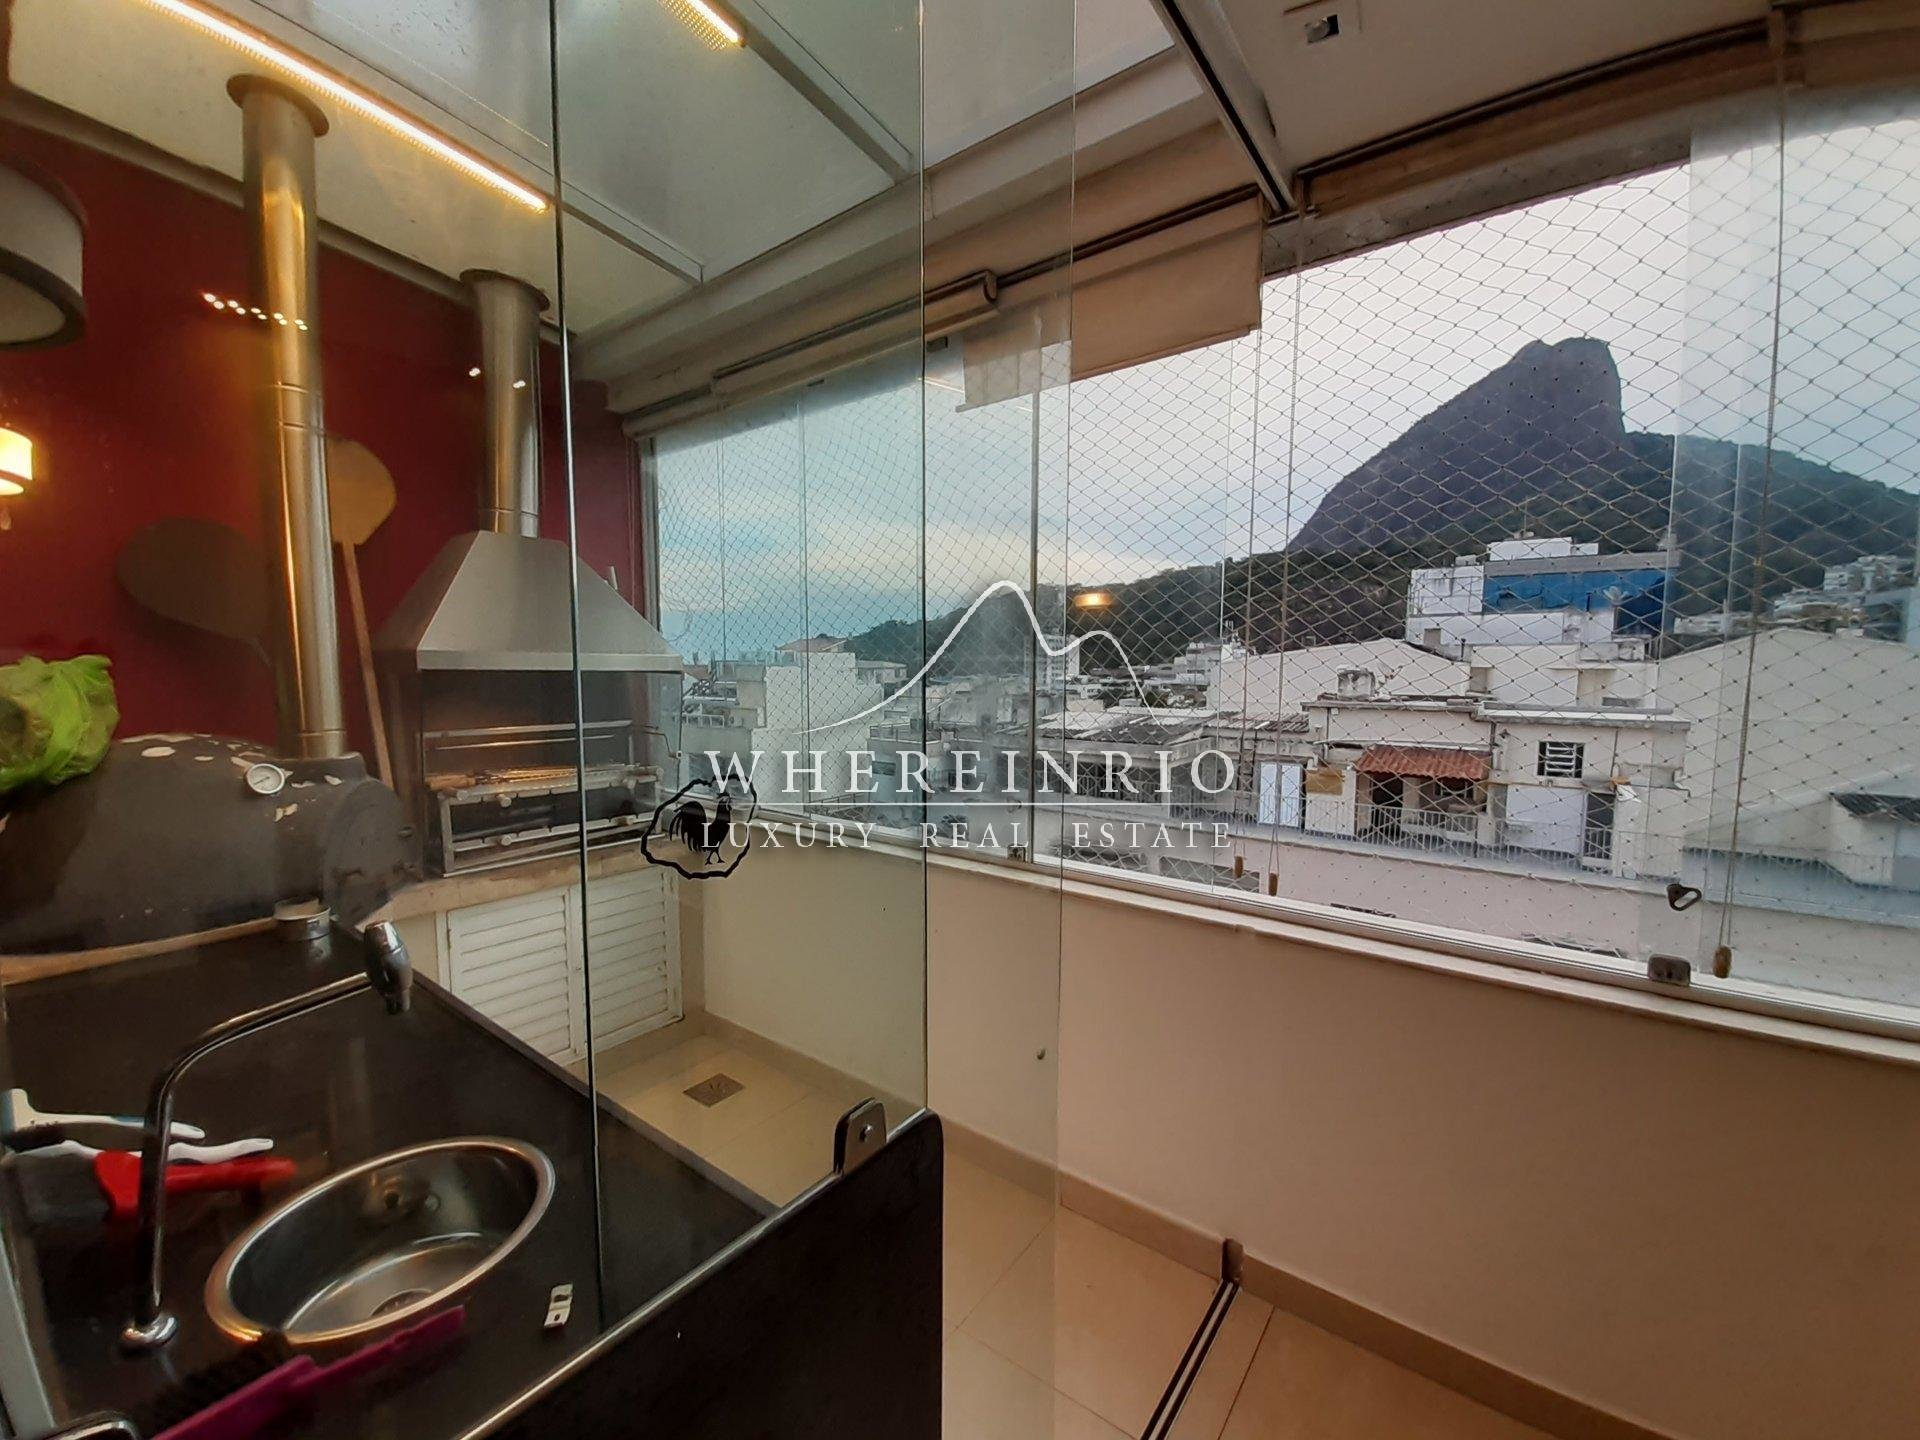 Wohnung in Rio de Janeiro, Brasilien 1